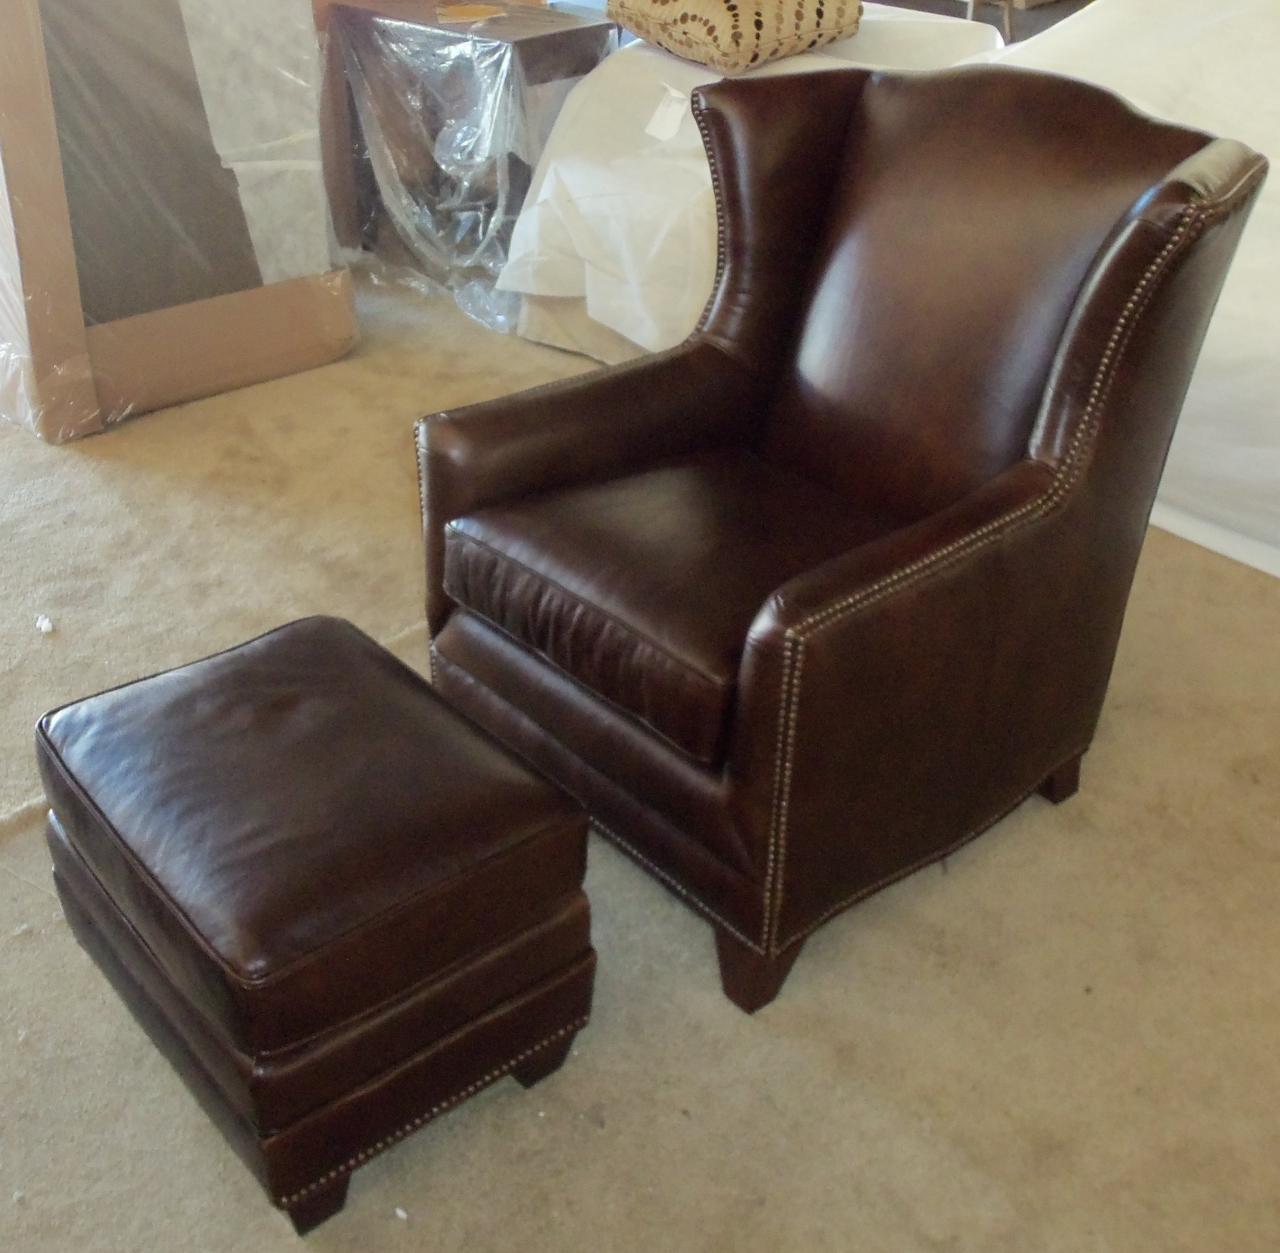 Barnett Furniture  King Hickory Athens chair